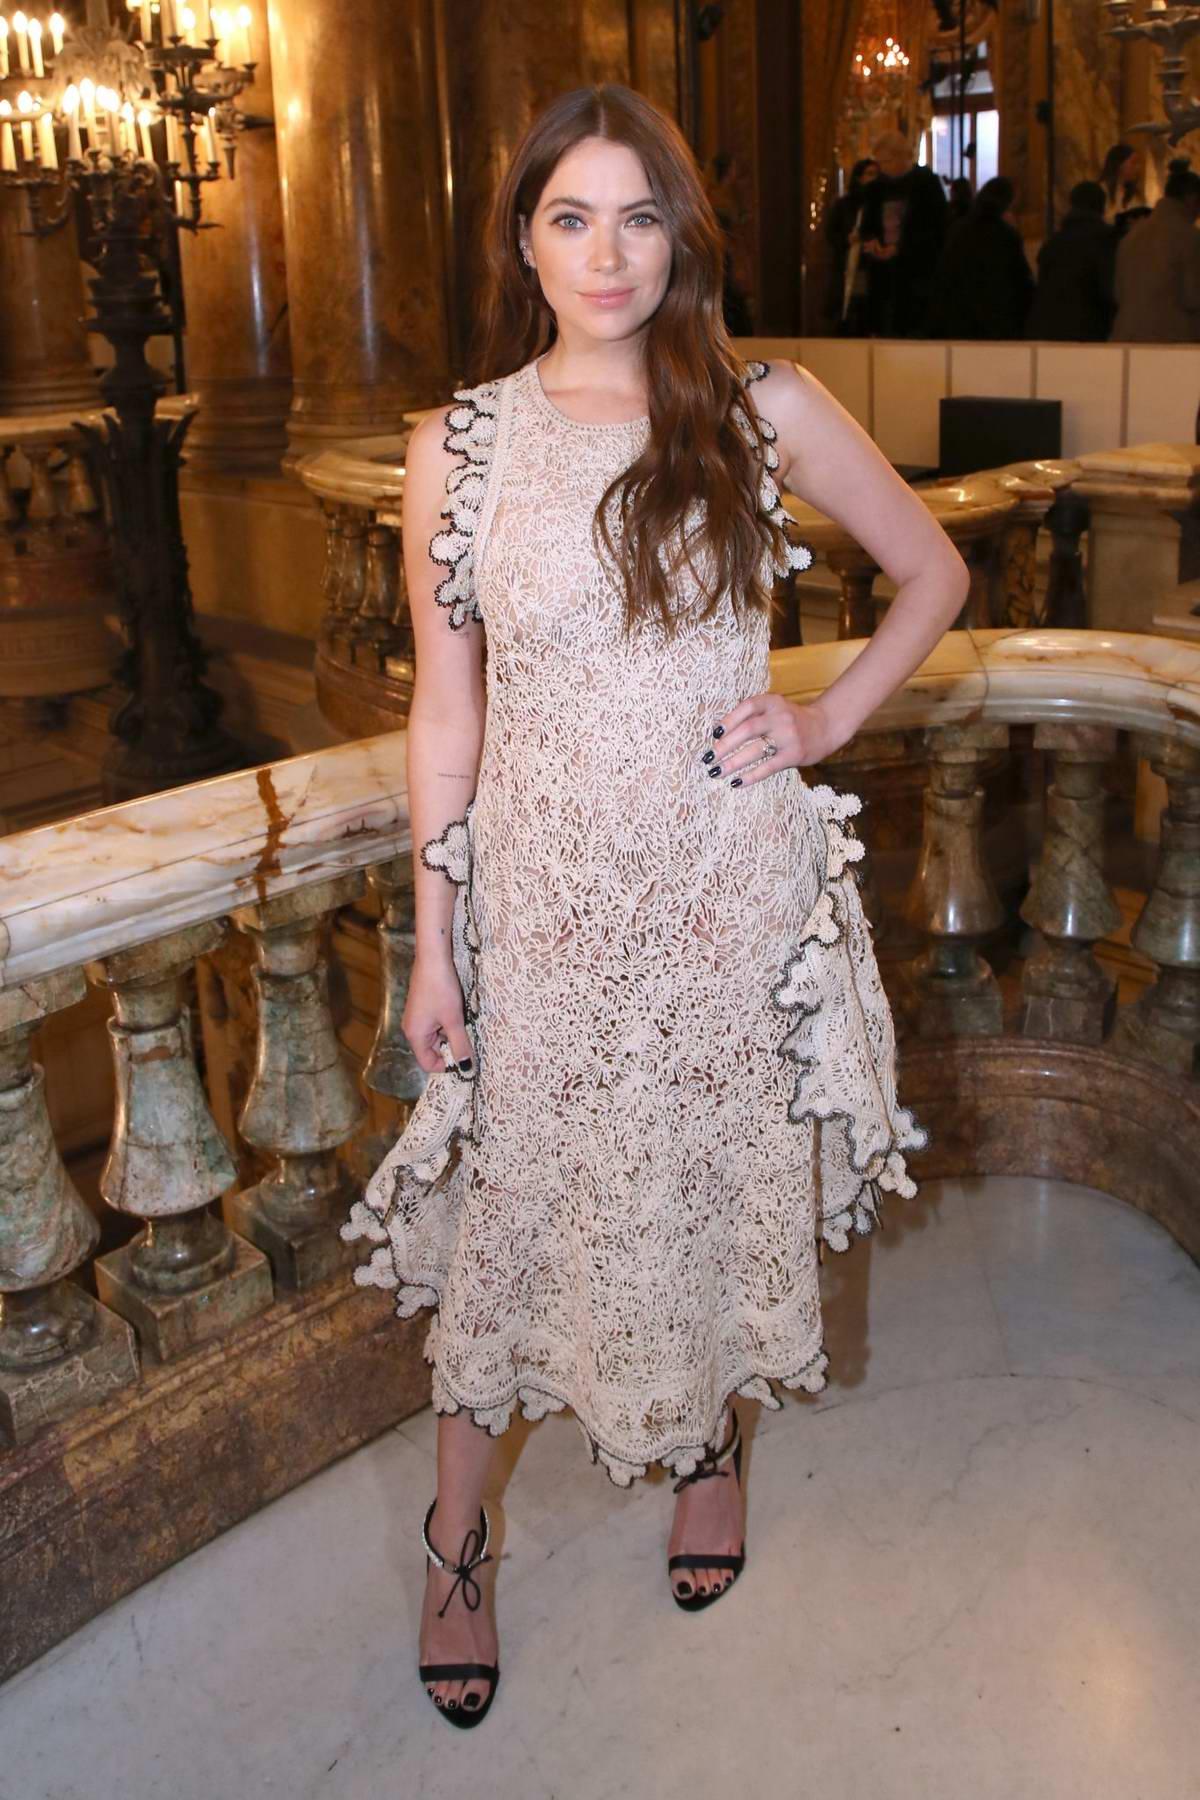 Ashley Benson attends the Stella McCartney show, F/W 2020 during Paris Fashion Week in Paris, France